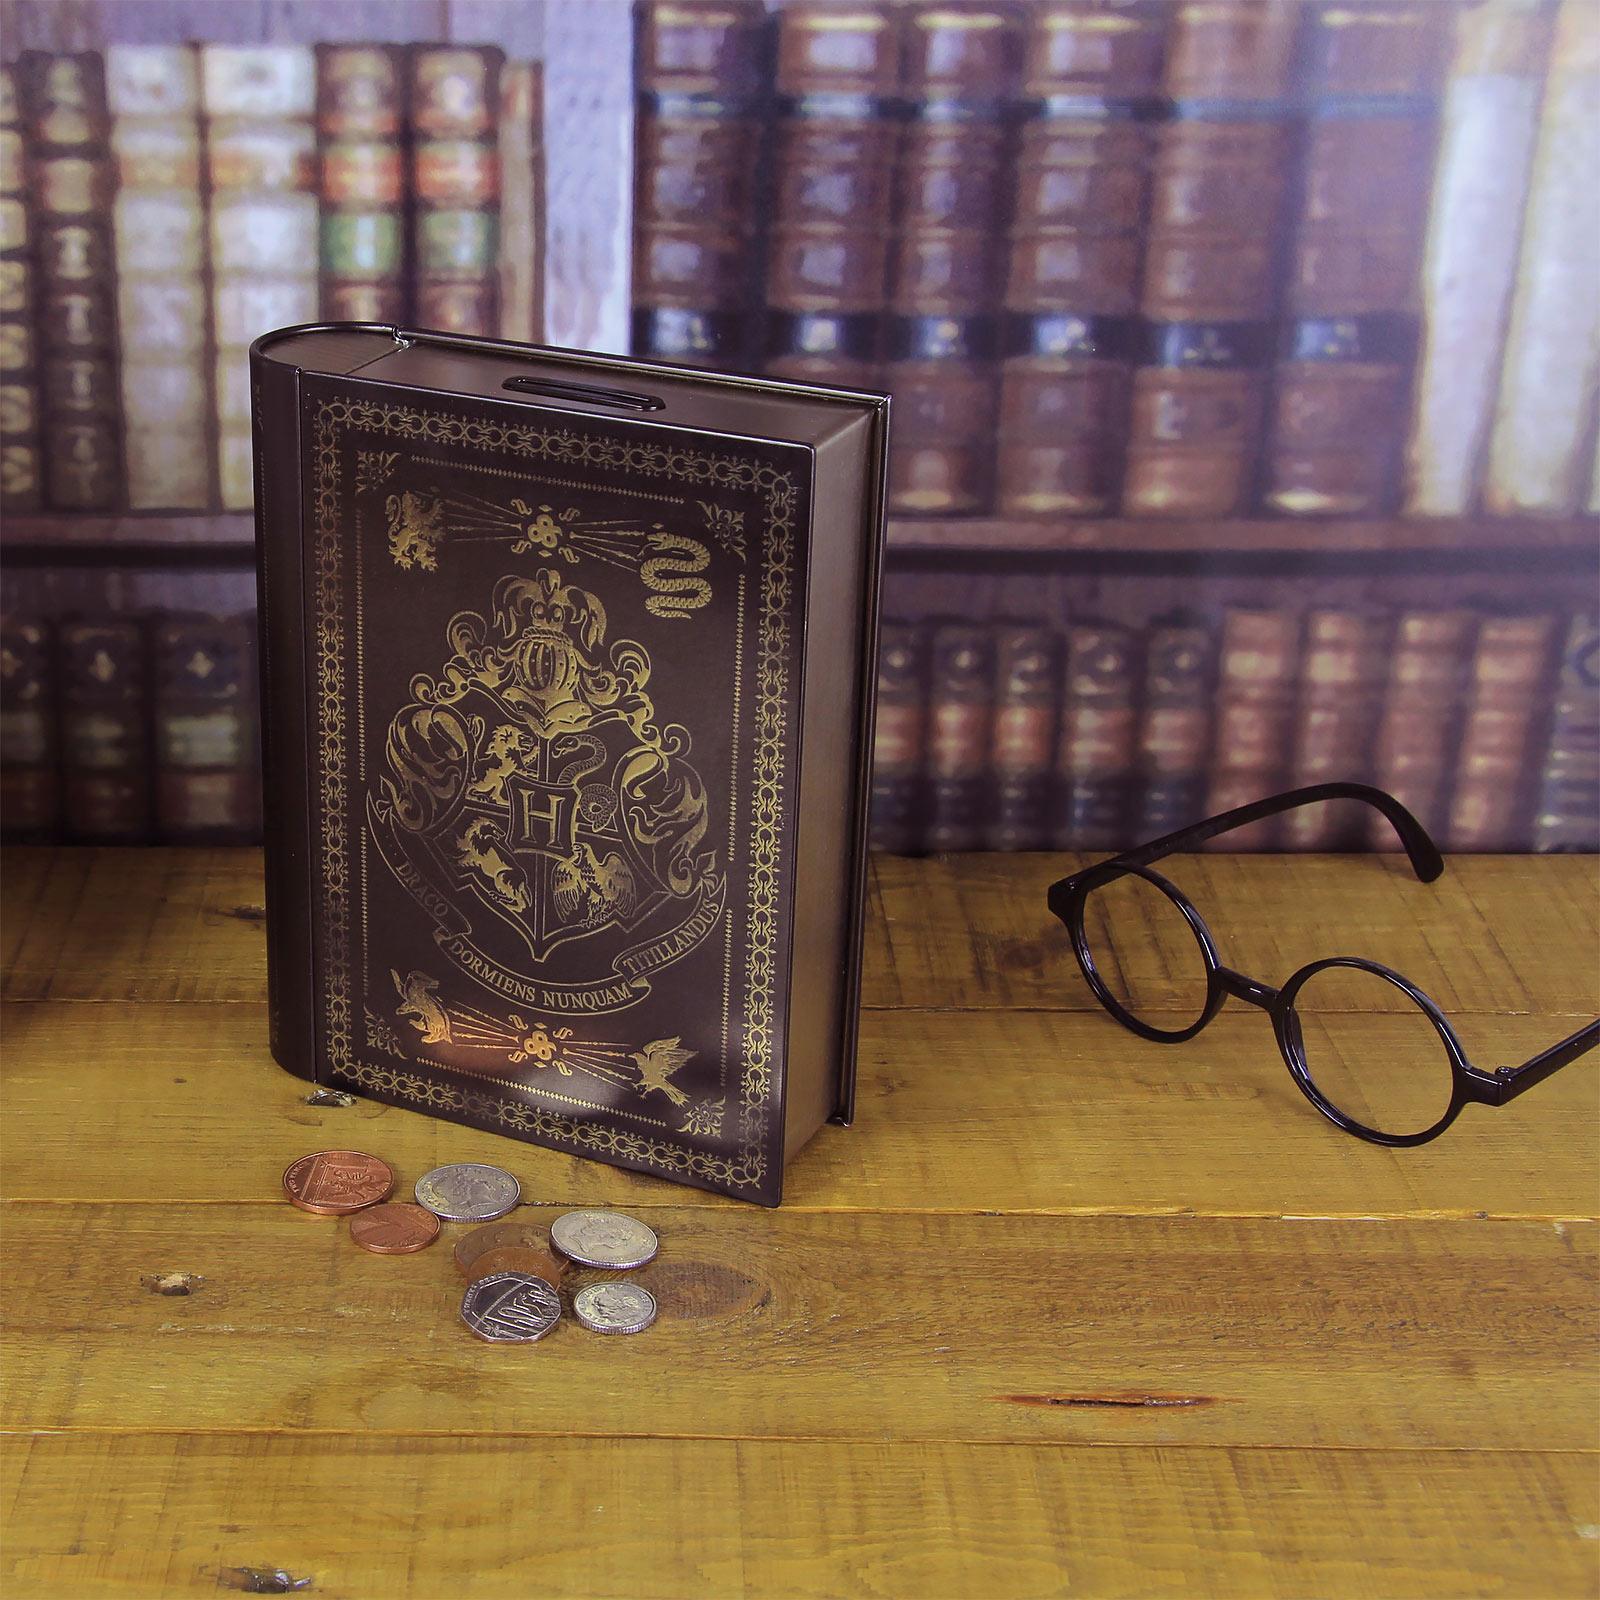 Harry Potter - Hogwarts Zauberbuch Spardose